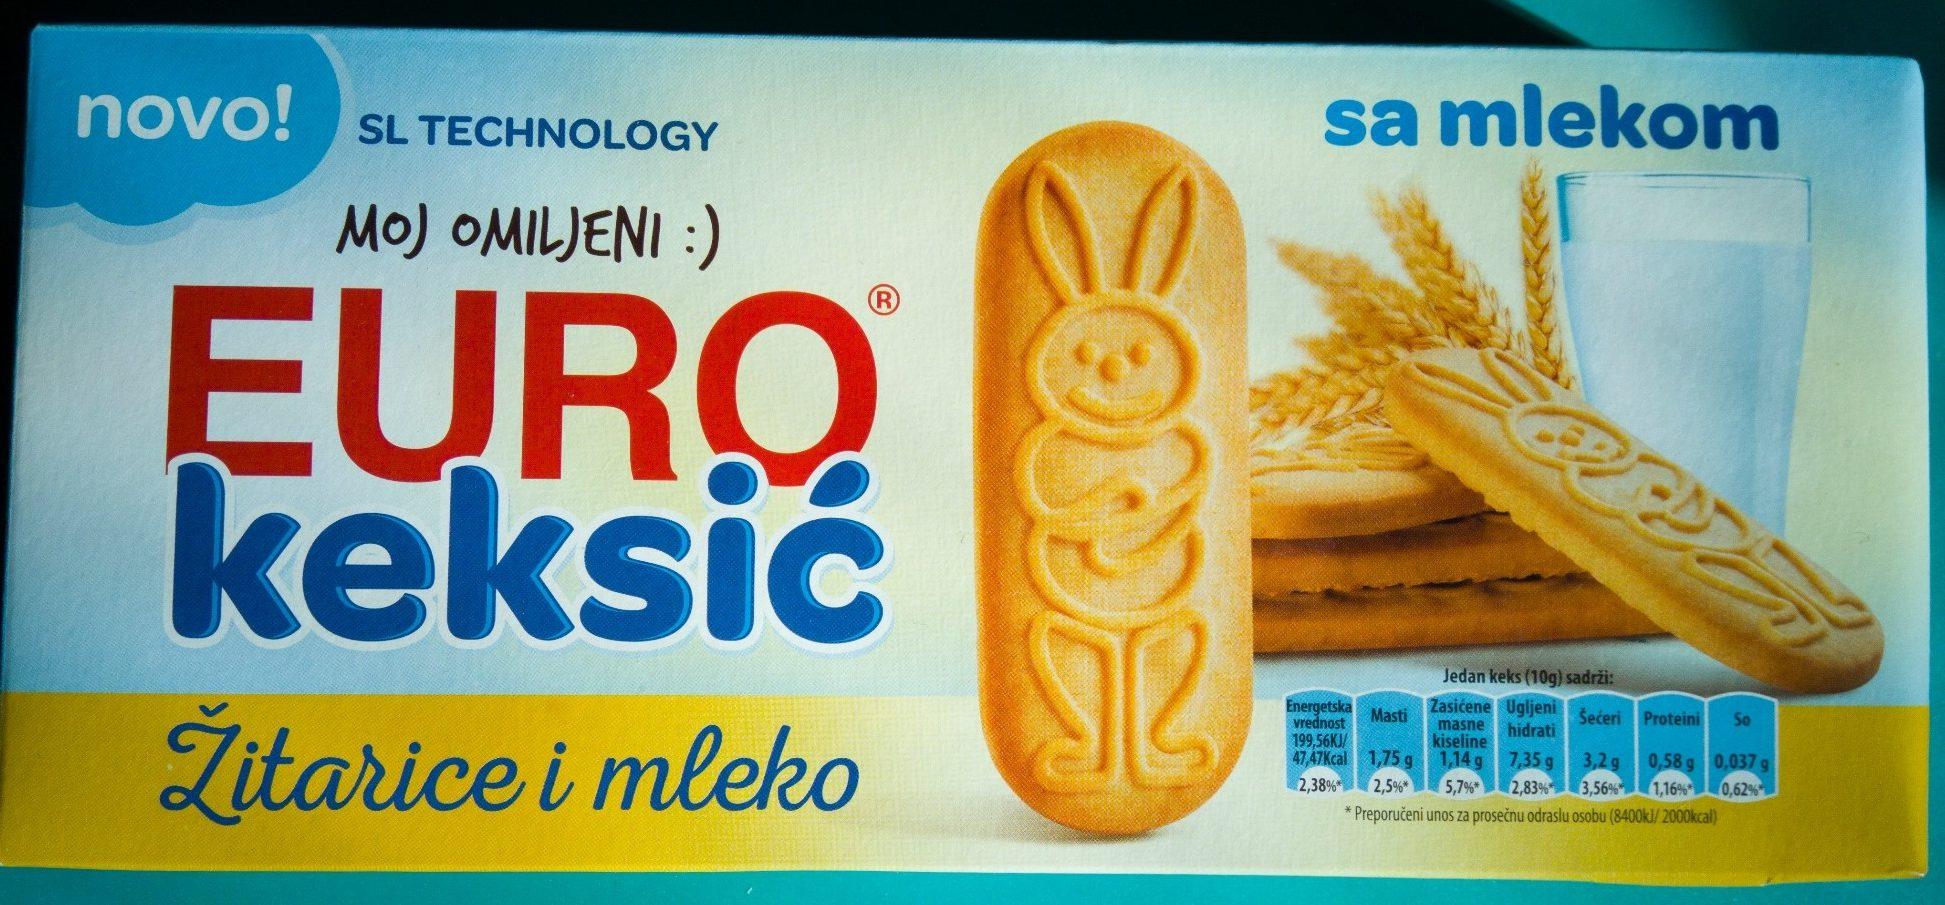 Euro keksic - Product - sr